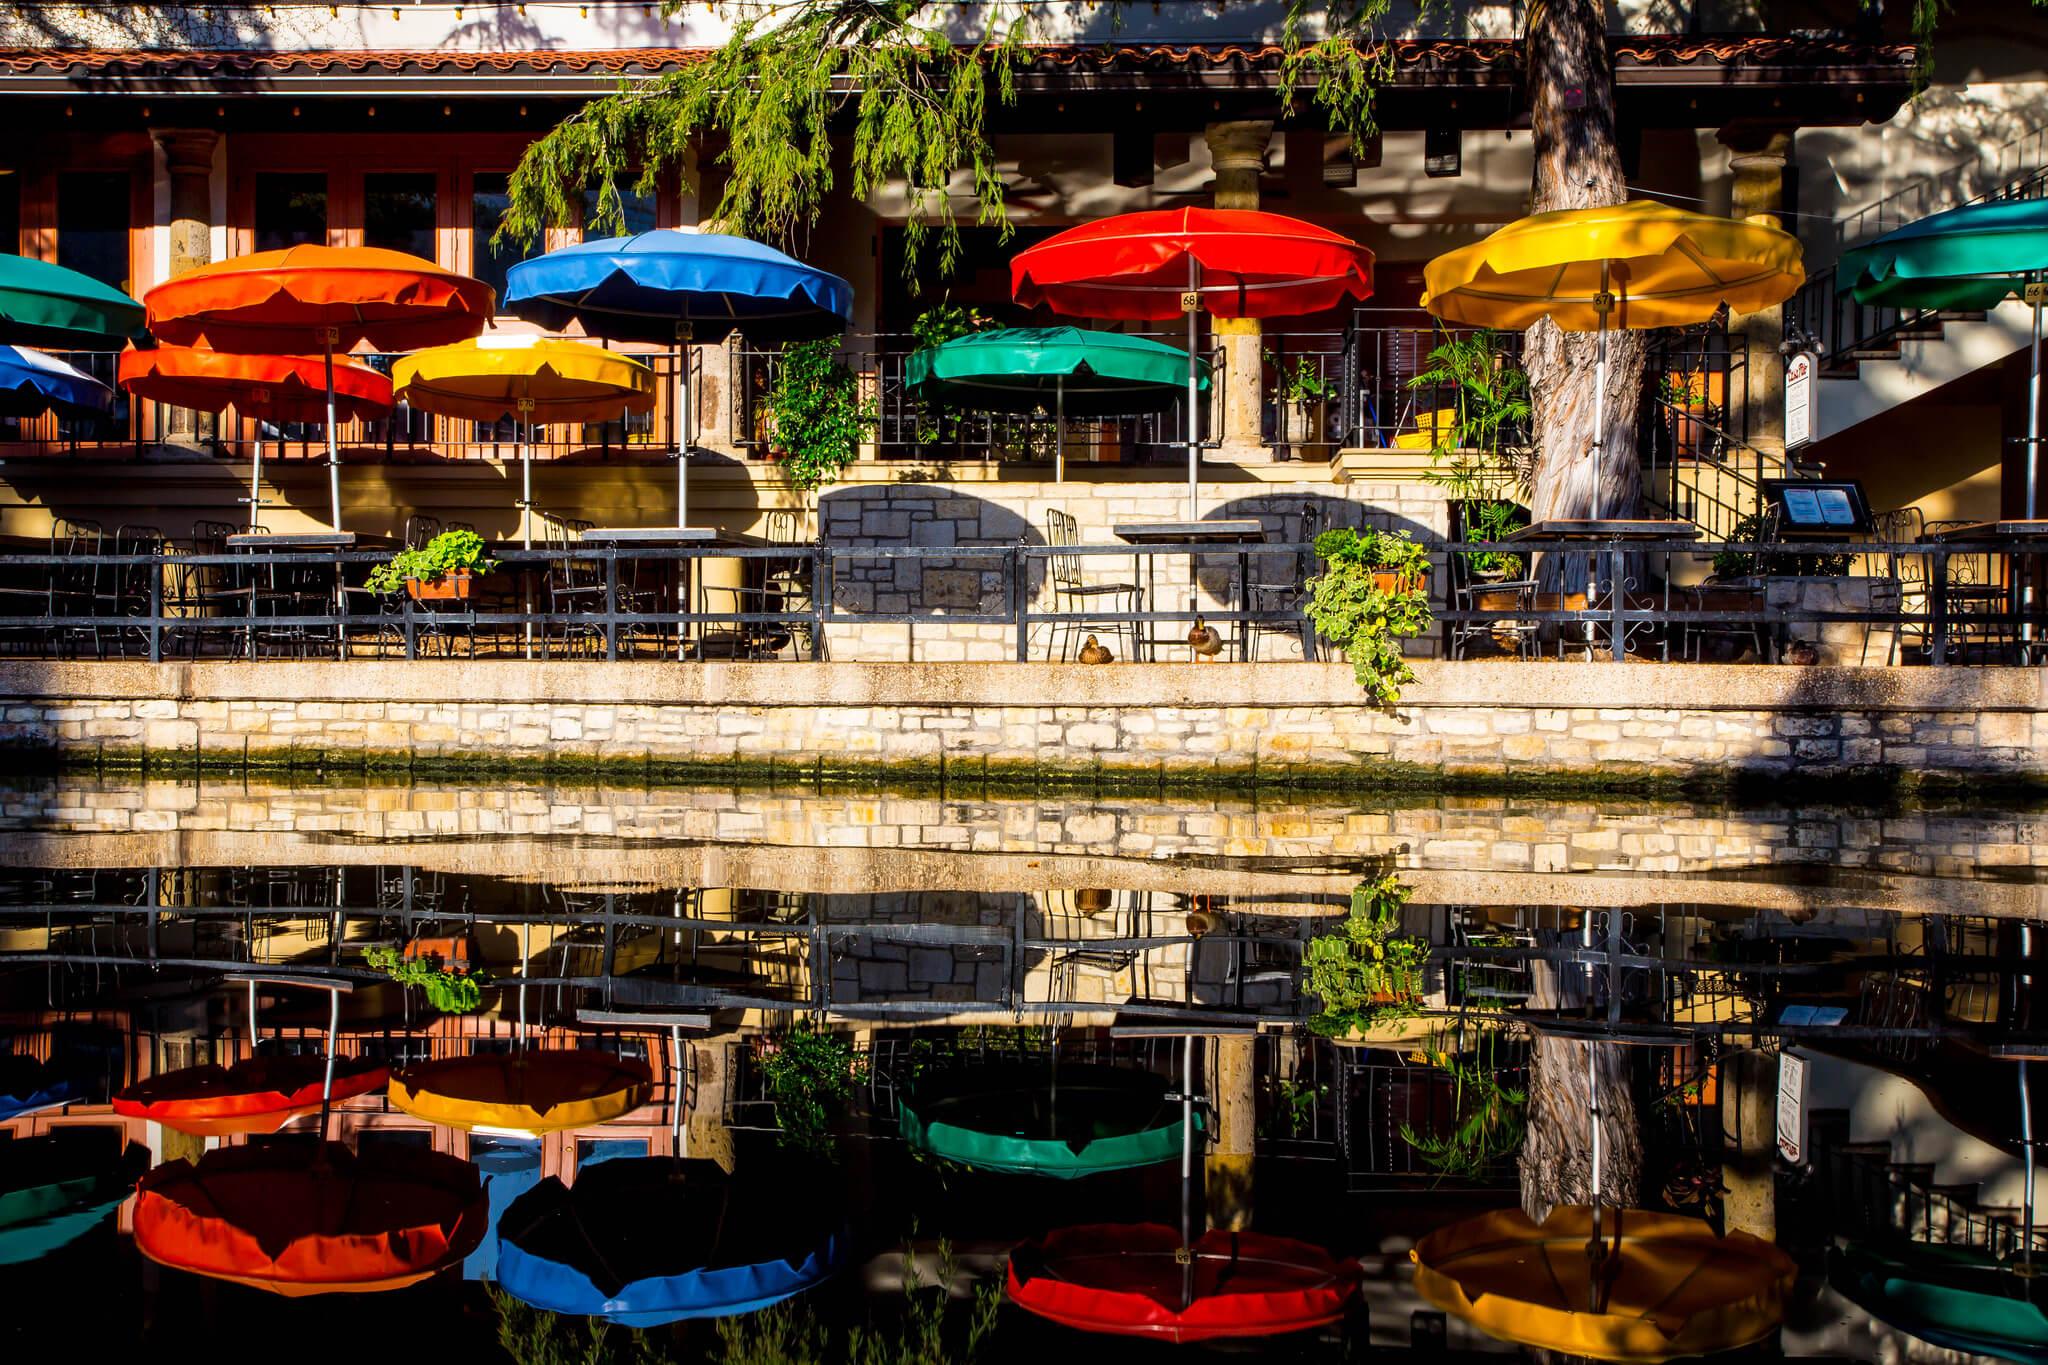 San Antonio Riverwalk Our Tasty Travels